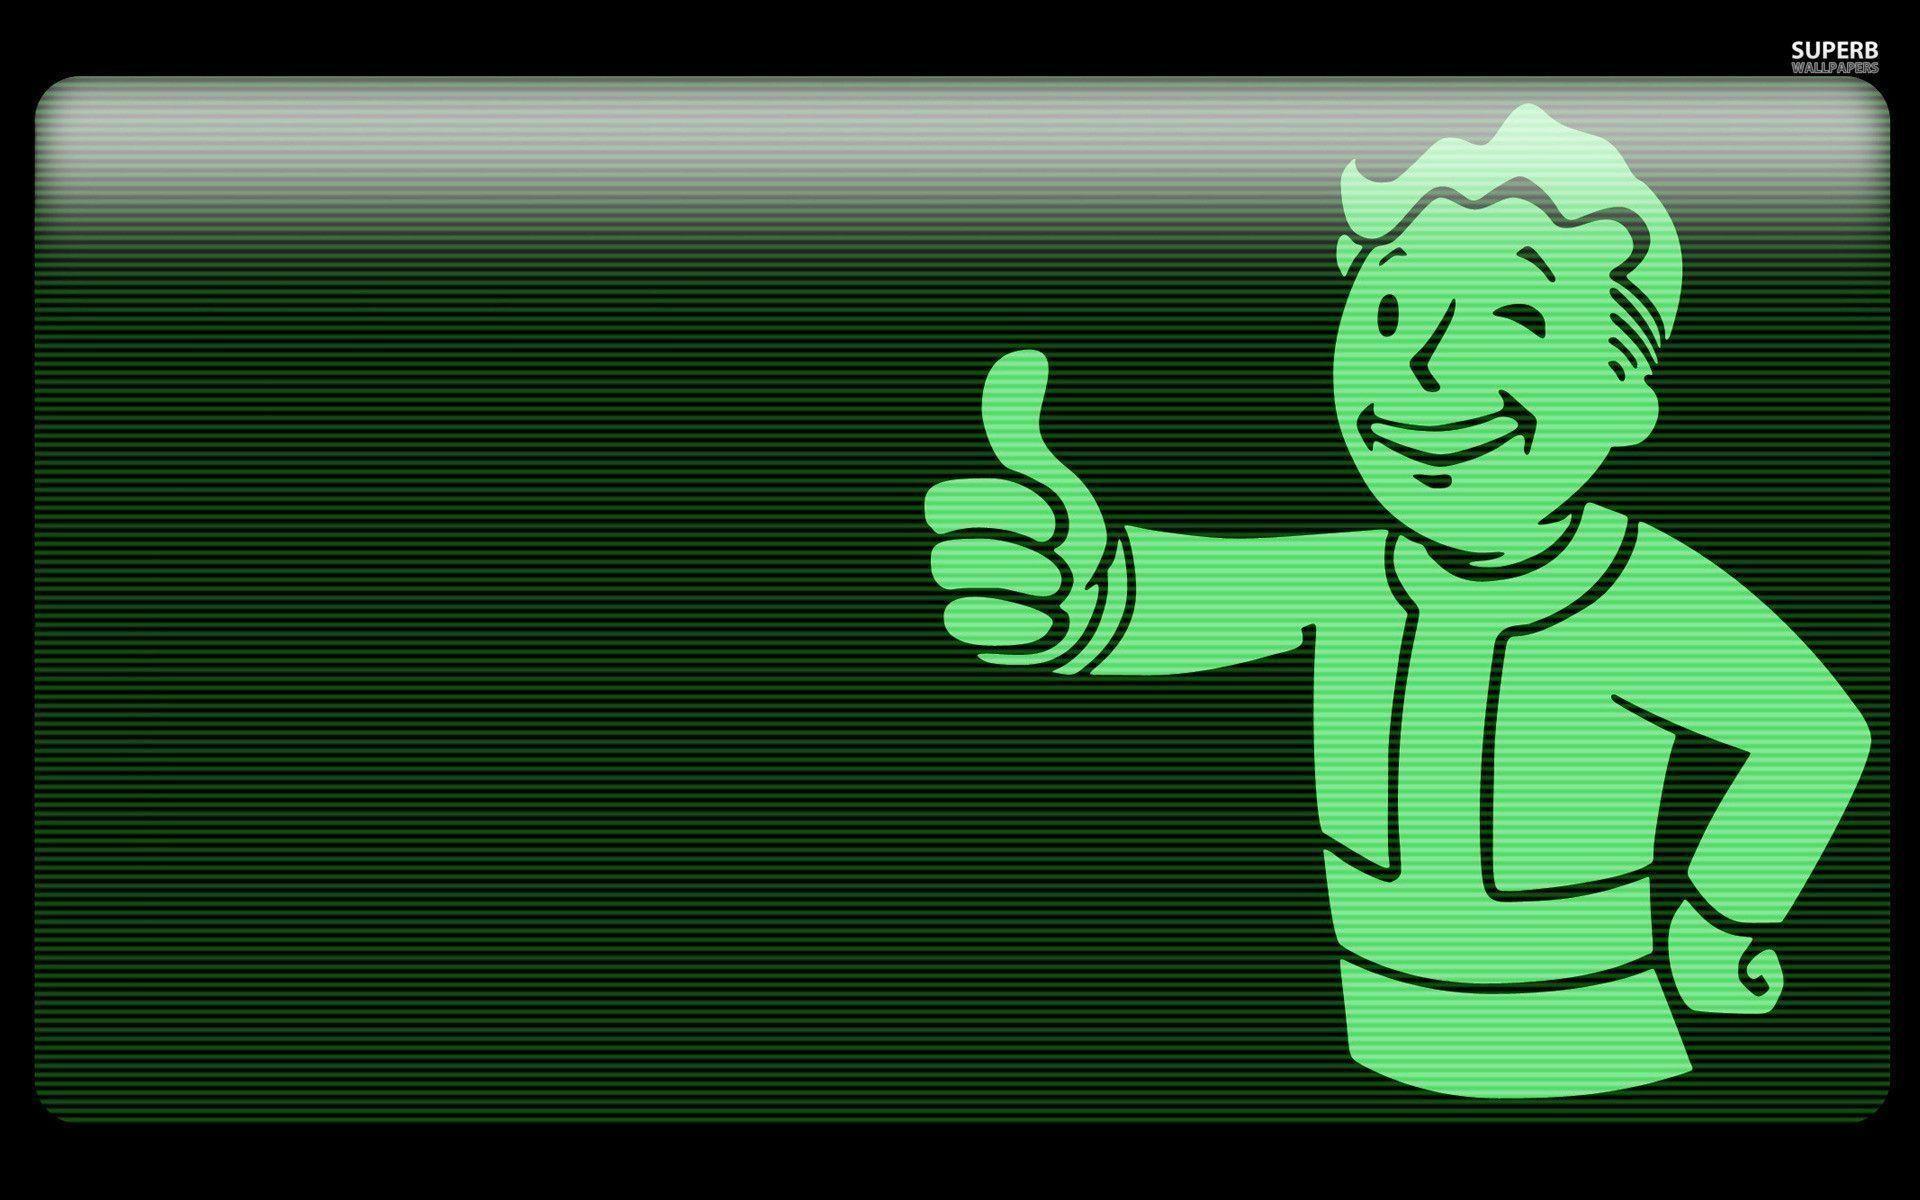 Fallout Pip Boy Wallpaper Hd 76 Images